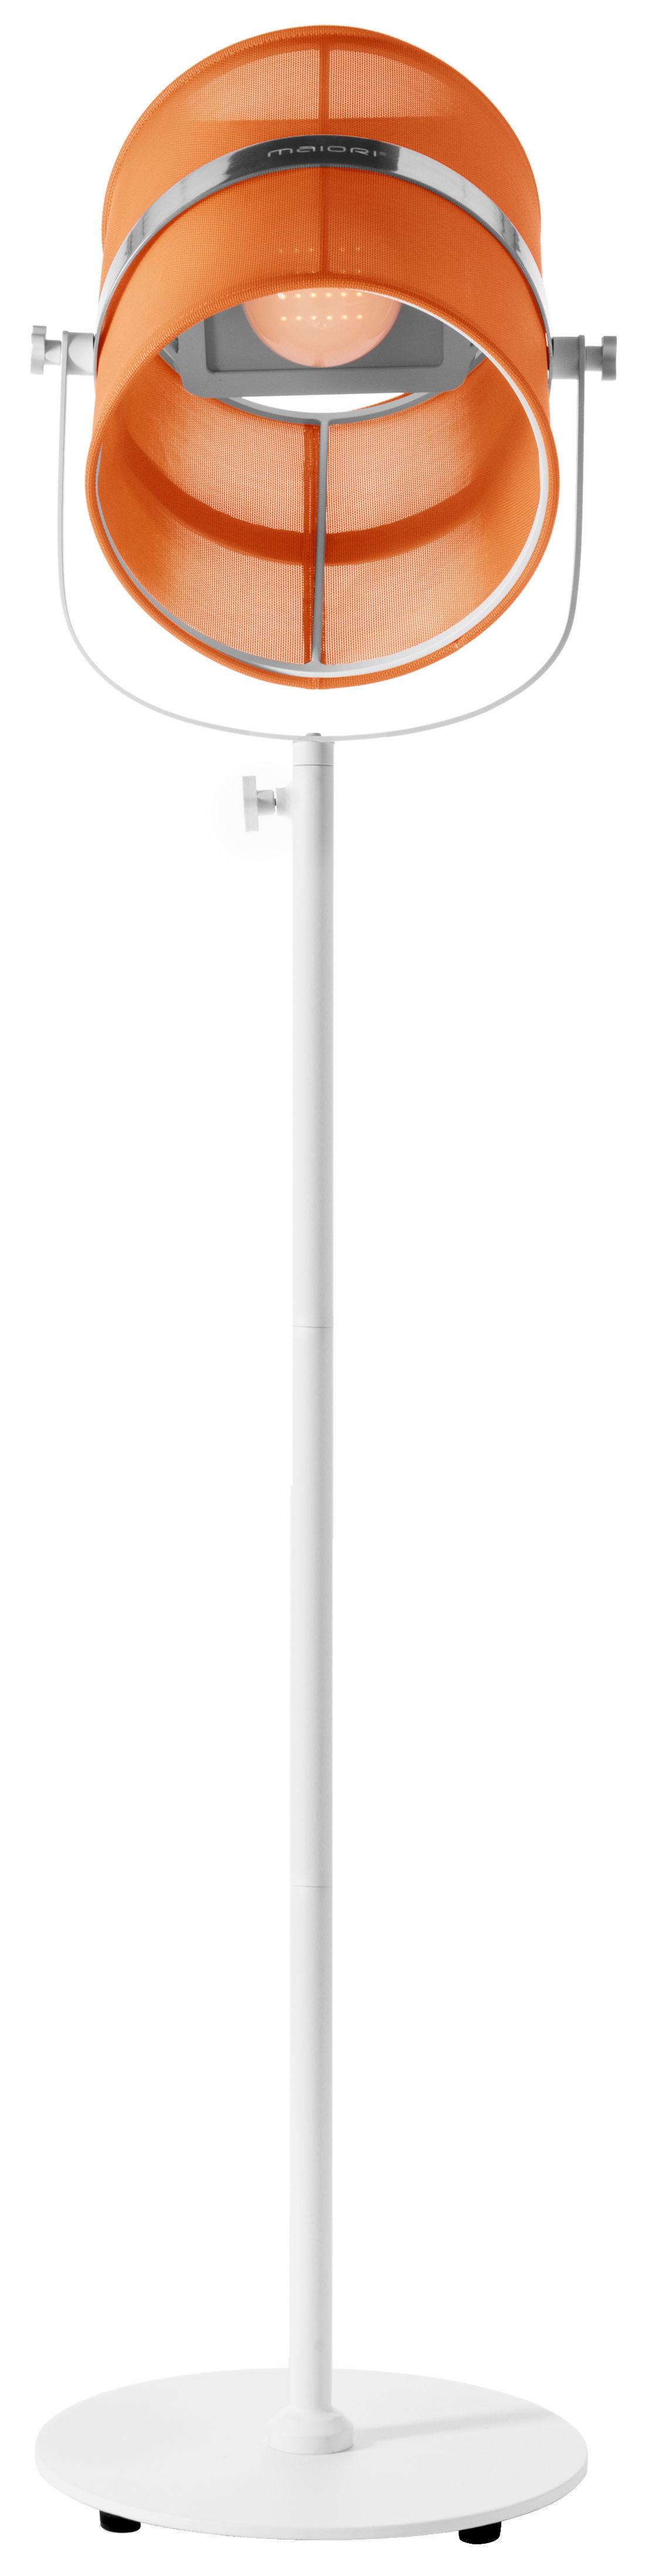 lampadaire solaire la lampe paris led sans fil orange pied blanc maiori. Black Bedroom Furniture Sets. Home Design Ideas